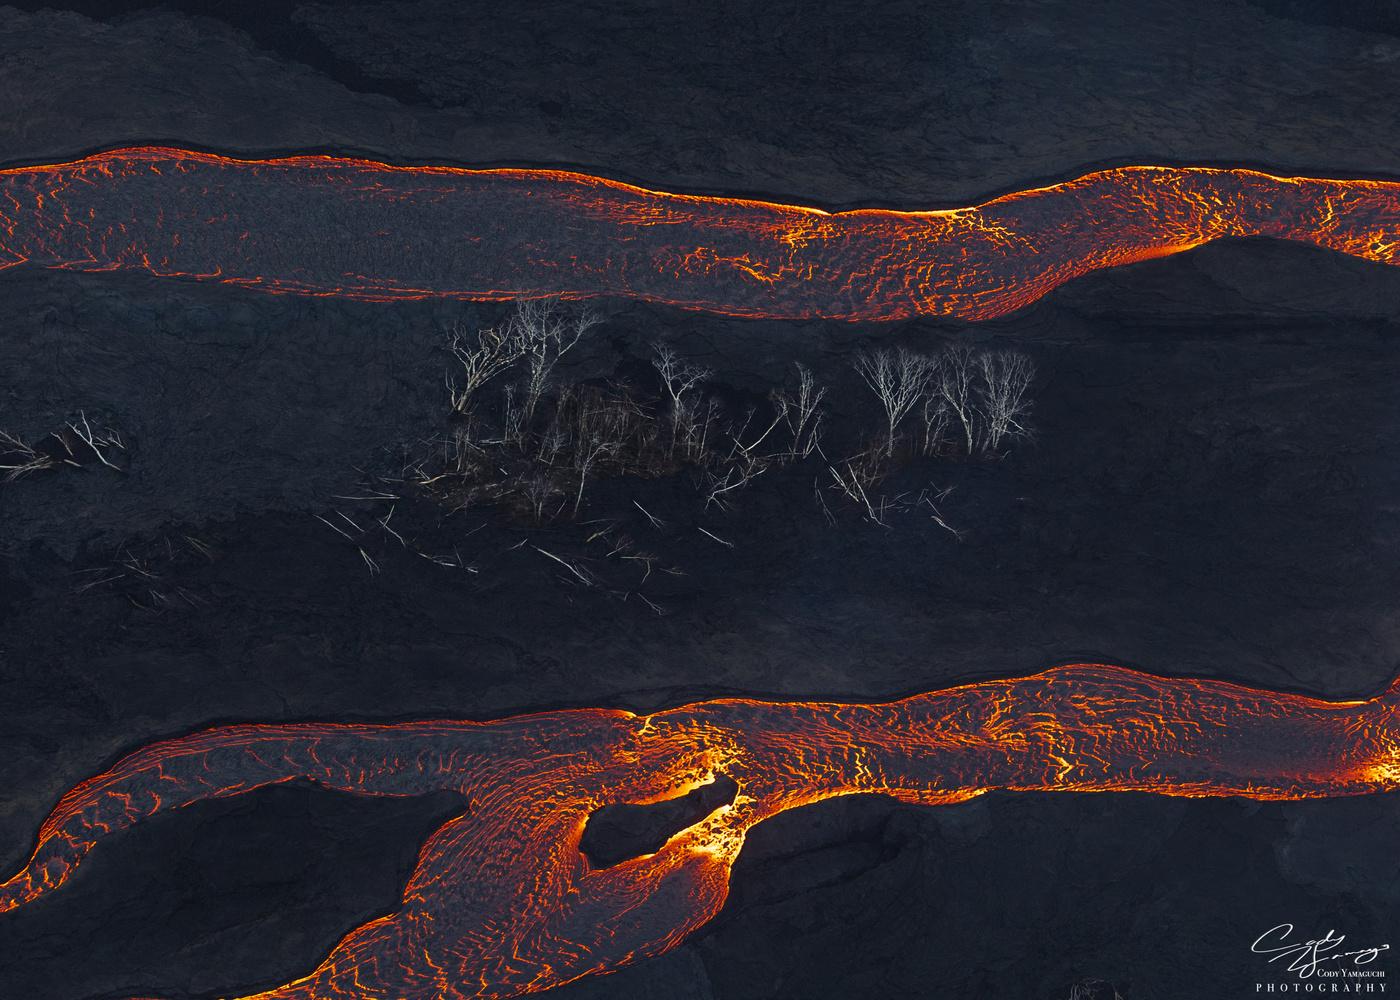 lava channels by Cody Yamaguchi